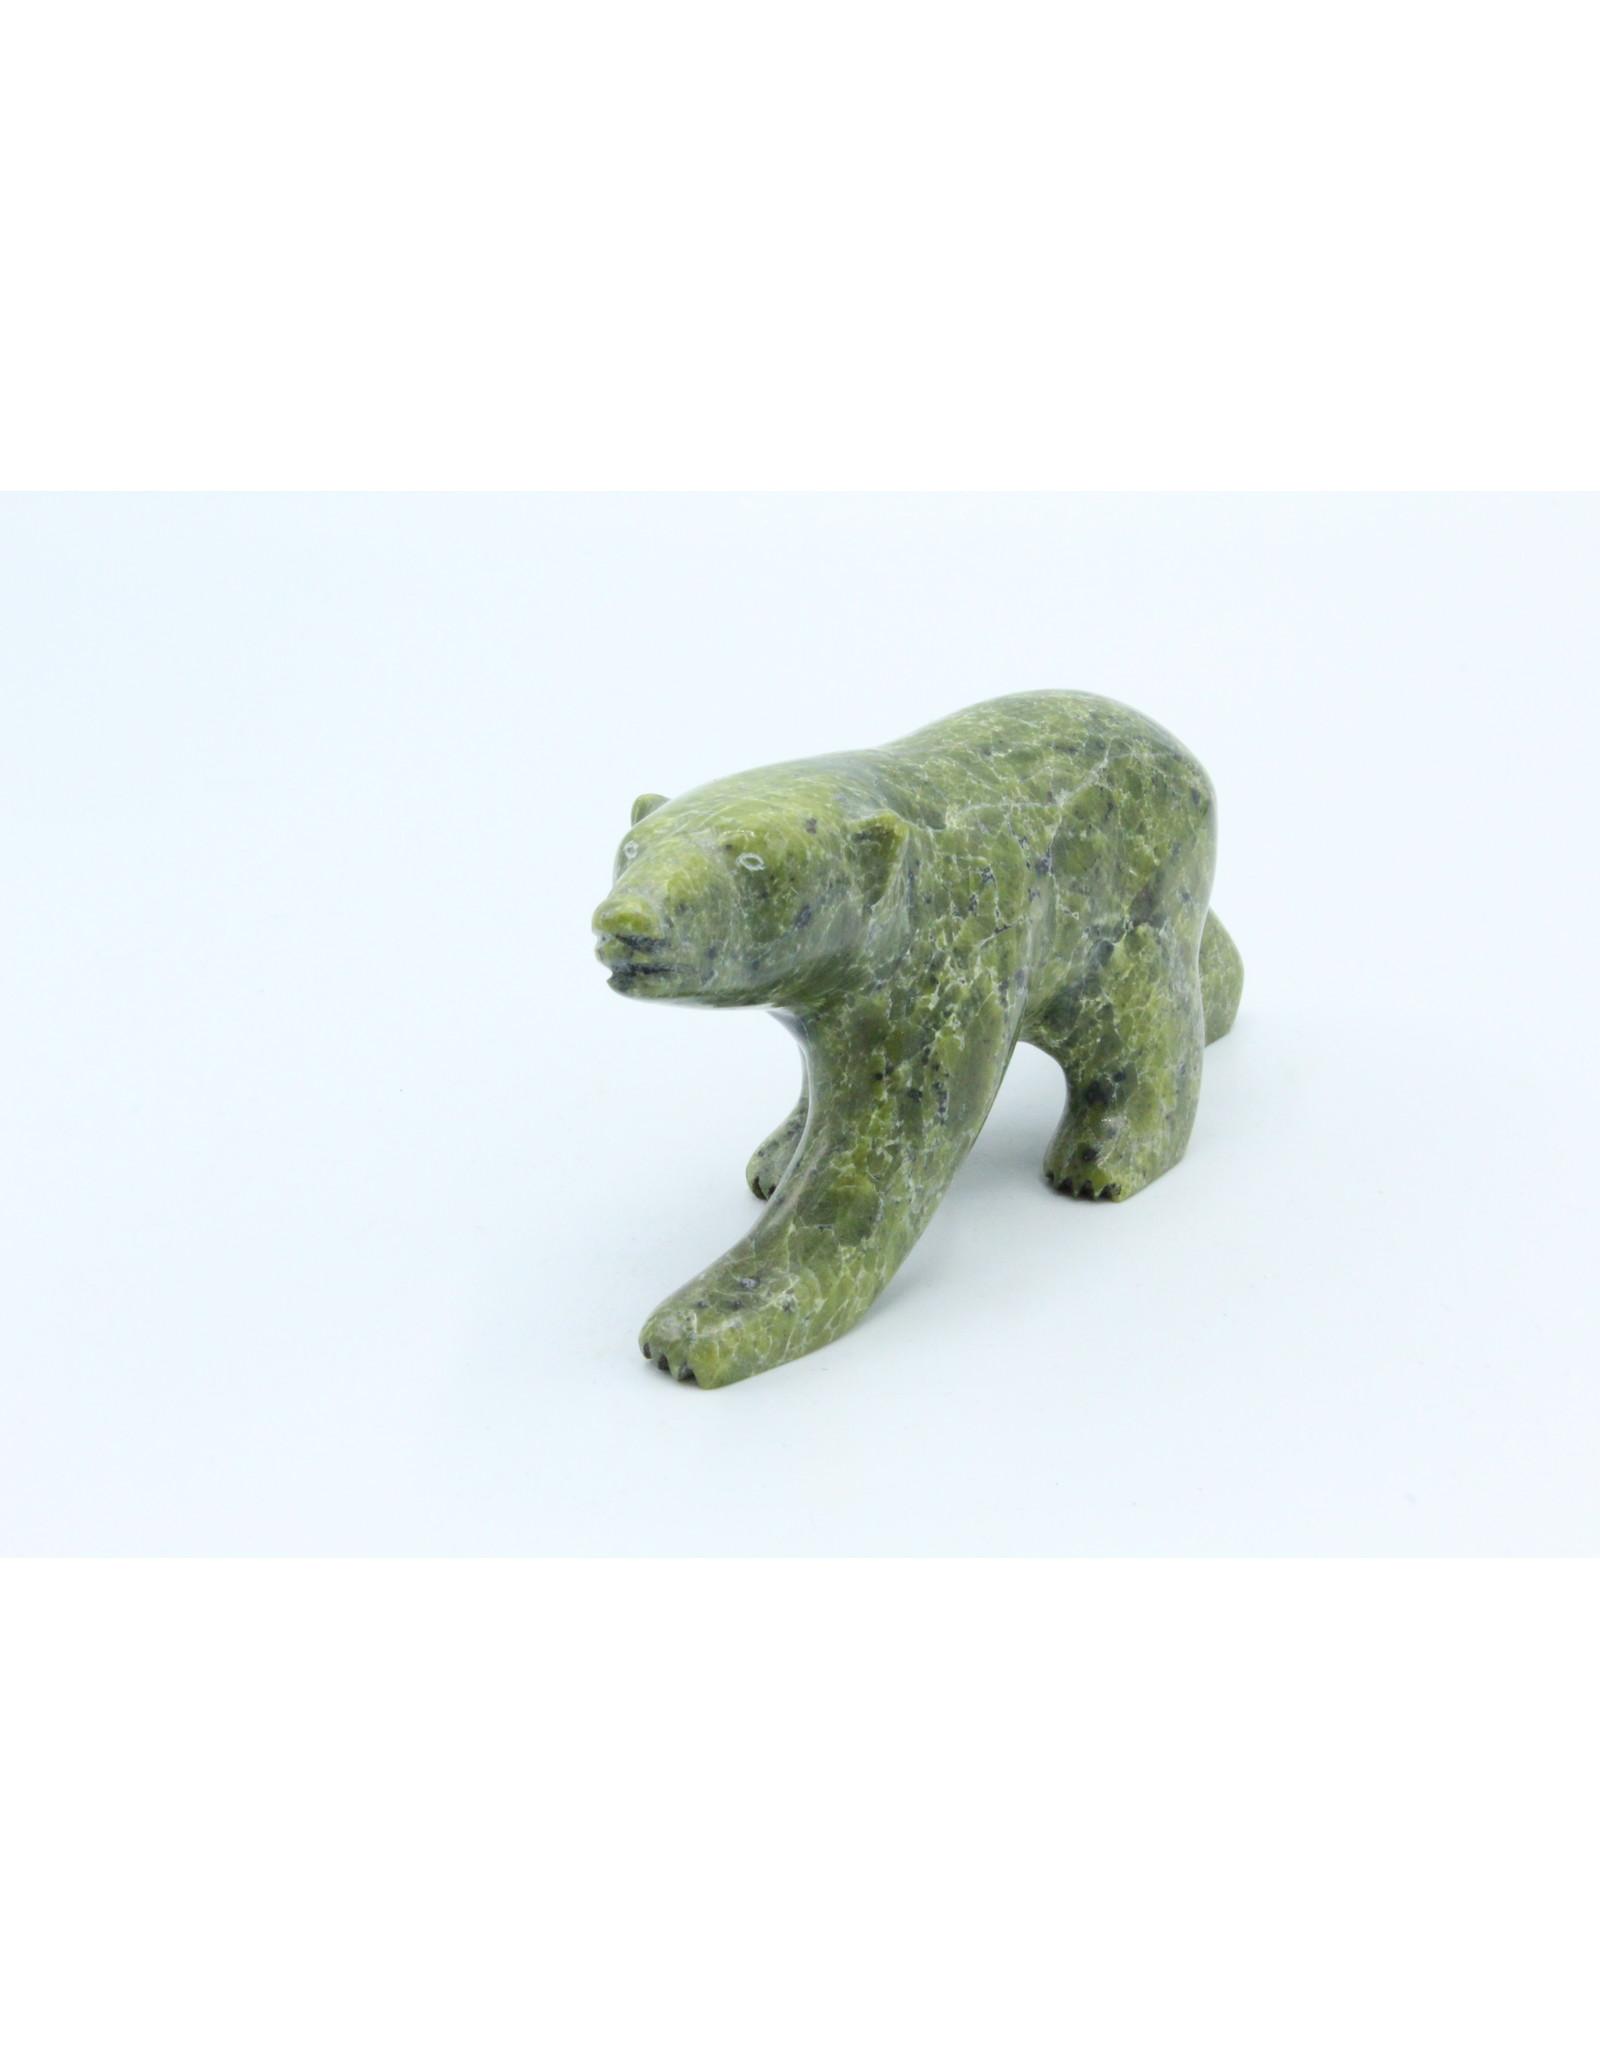 63862 Bear by Allan Shutiapik